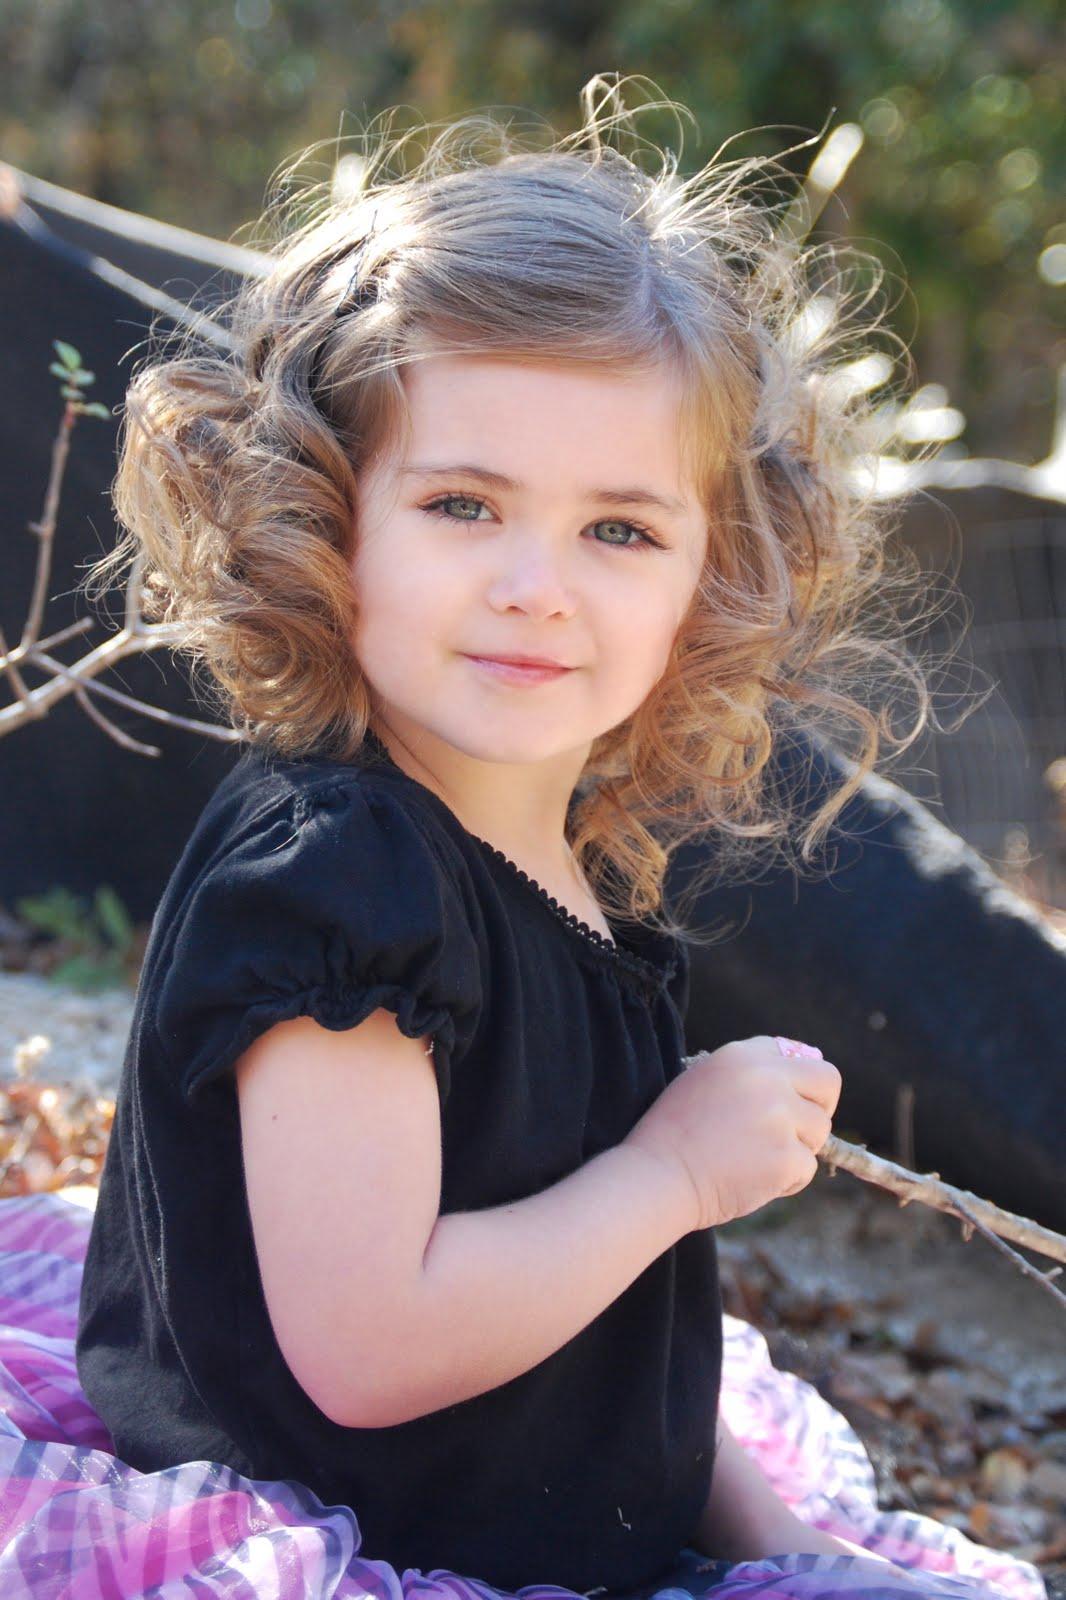 Cute Baby Girl Photos Wallpapers صور اطفال بنات صغيرة مواليد في خلفيات بنات بجودة Hd سوبر